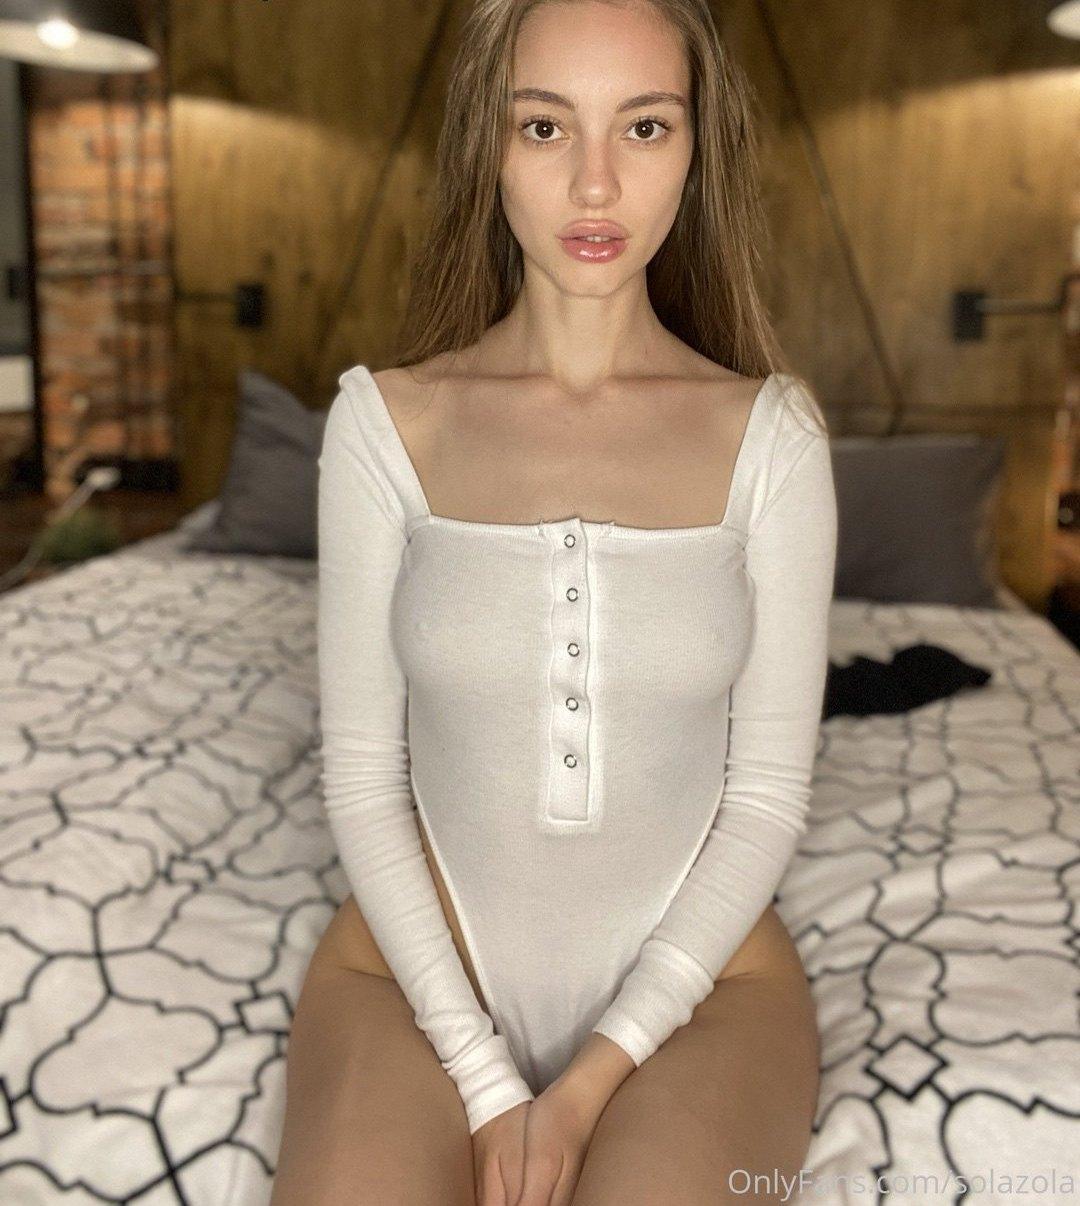 Solazola Onlyfans Nudes Leaks 0001